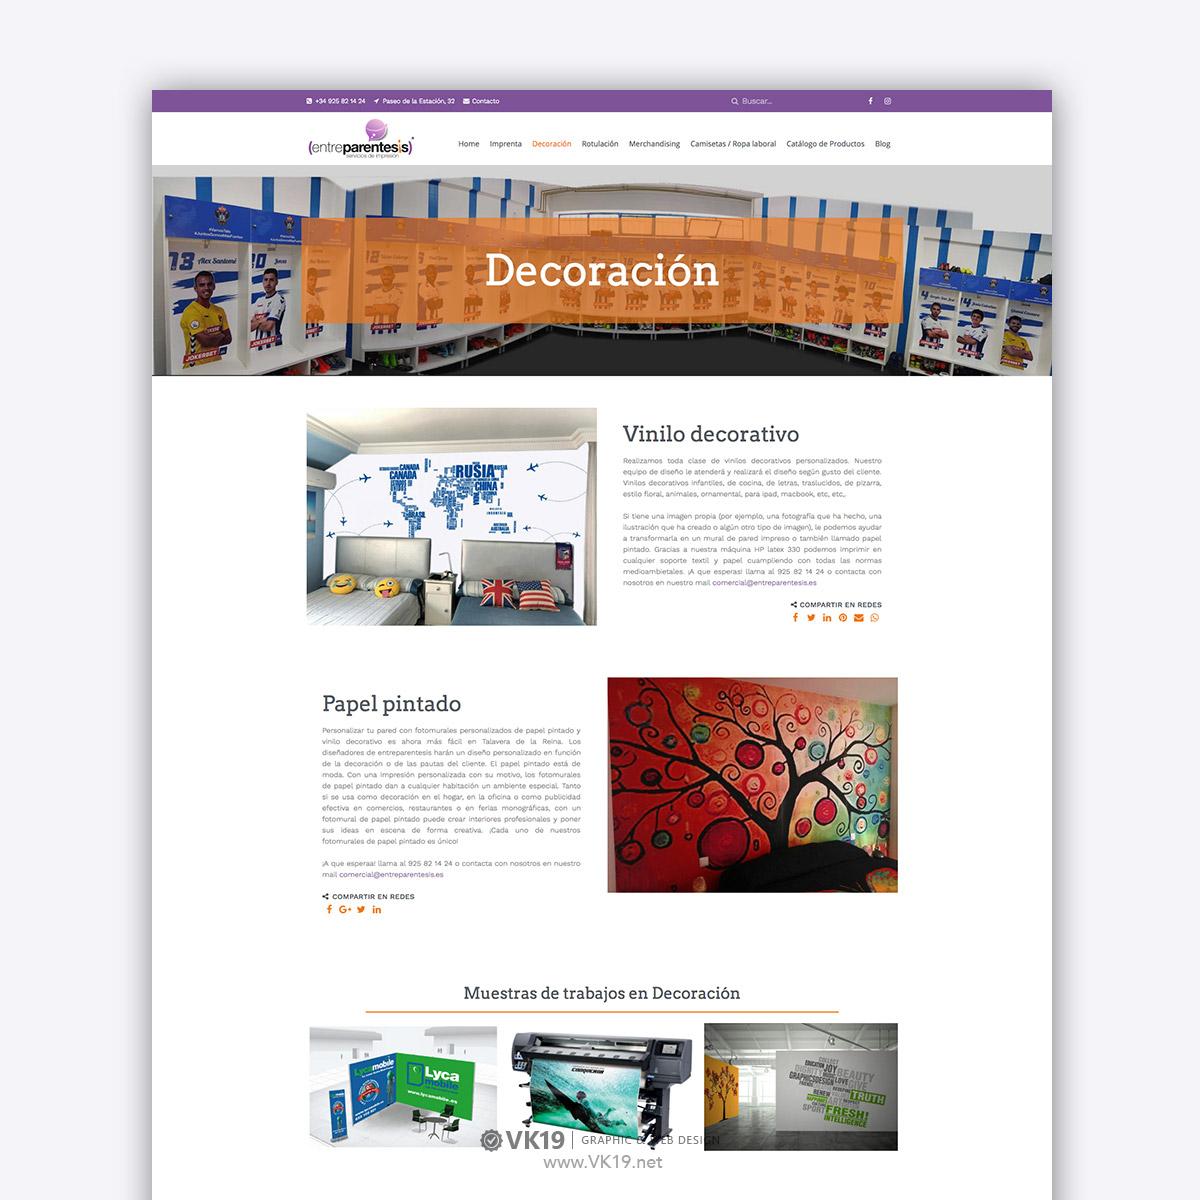 web-decoracion-entreparentesis-vk19